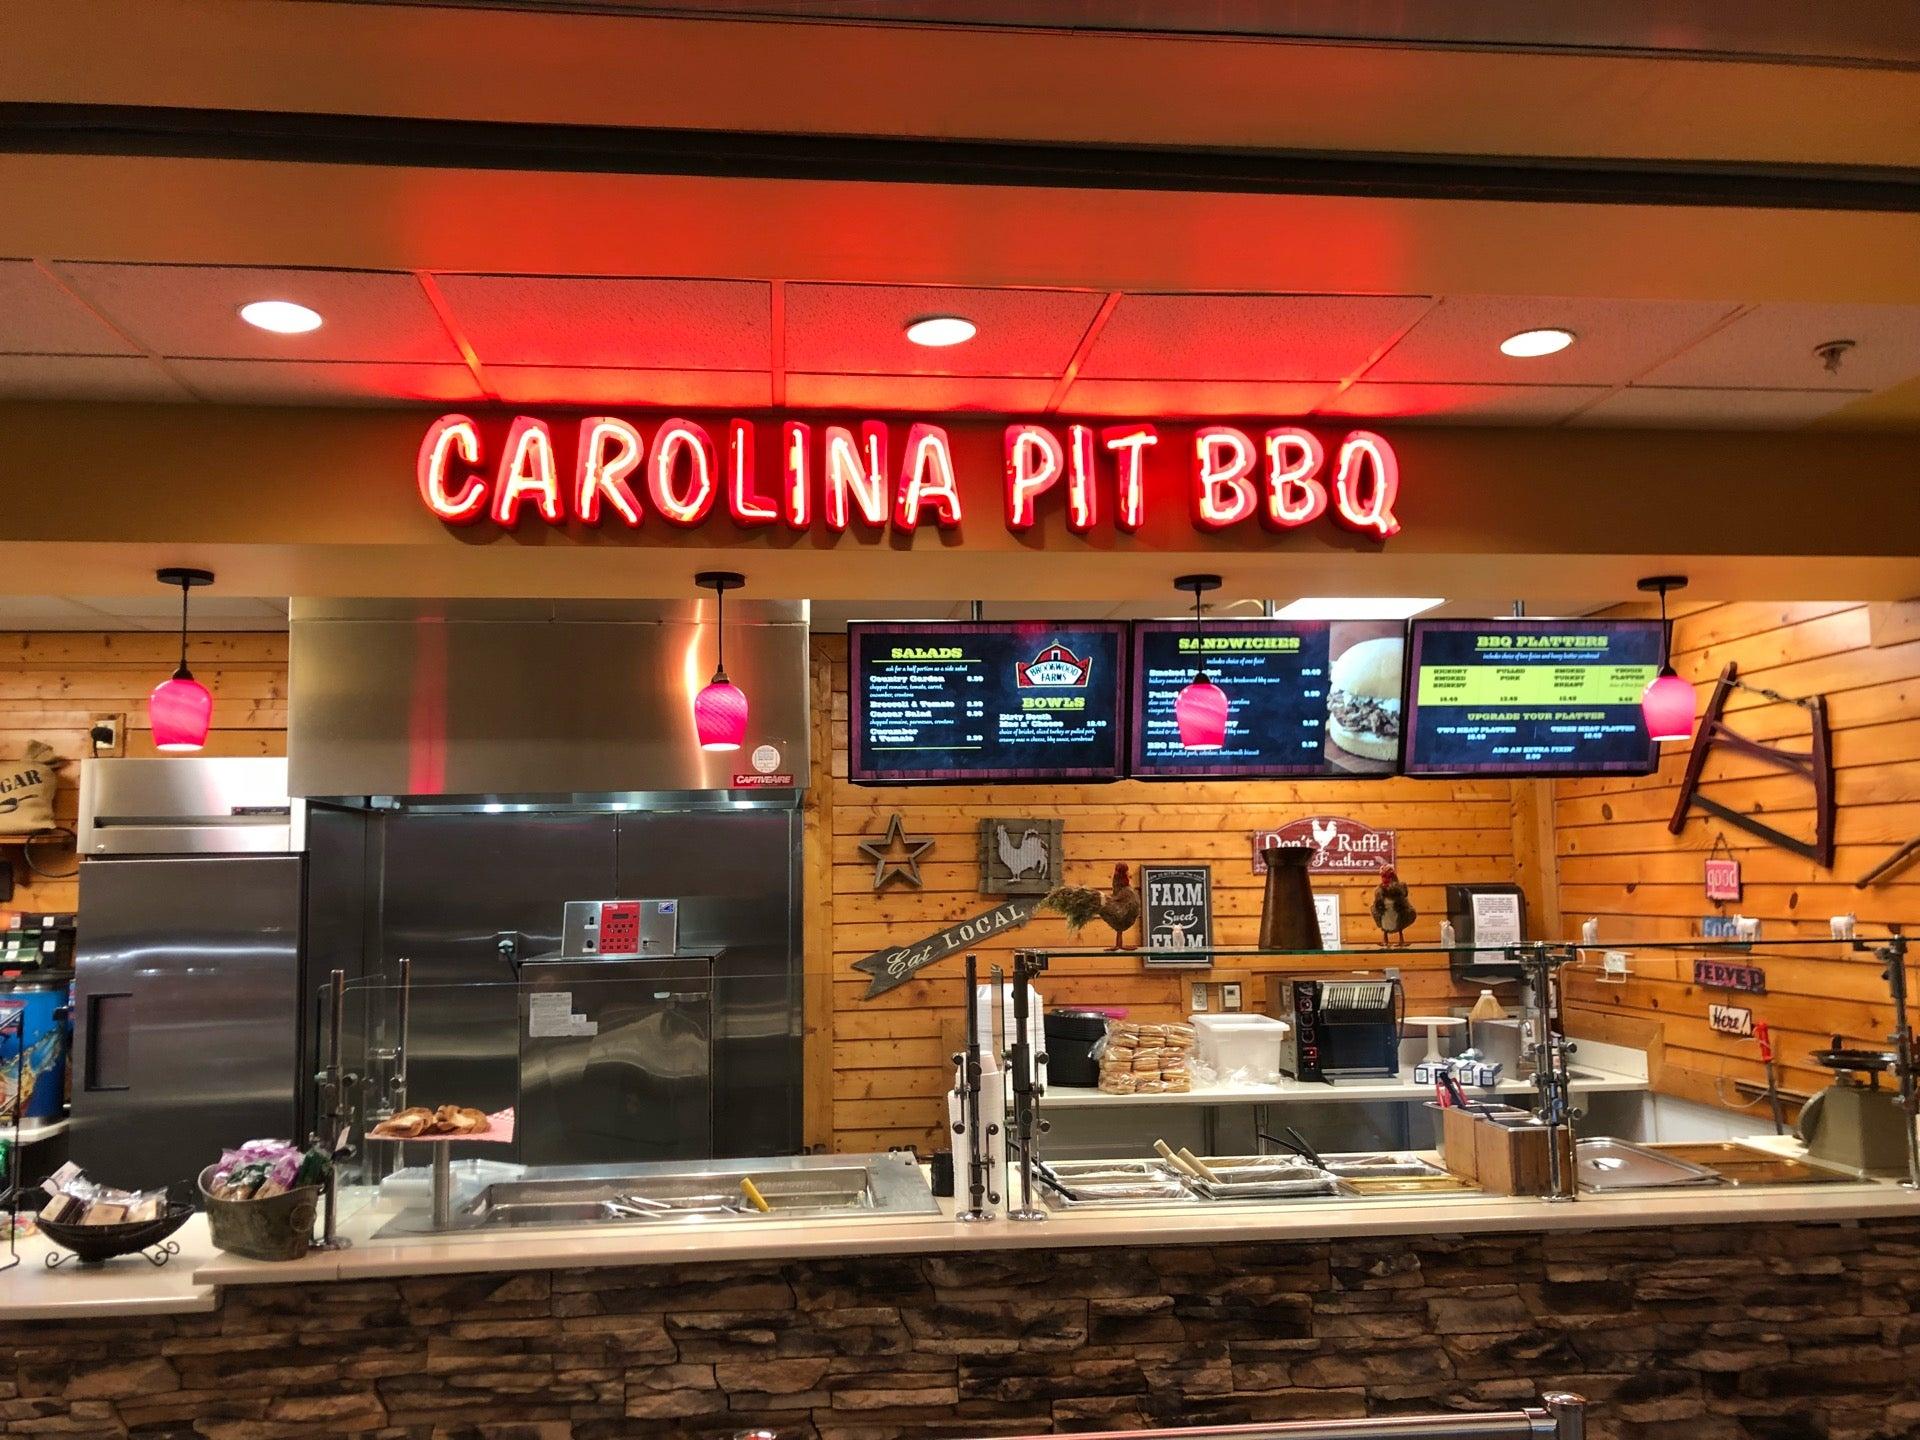 Raleigh Airport Restaurants | Best Restaurants Near Me